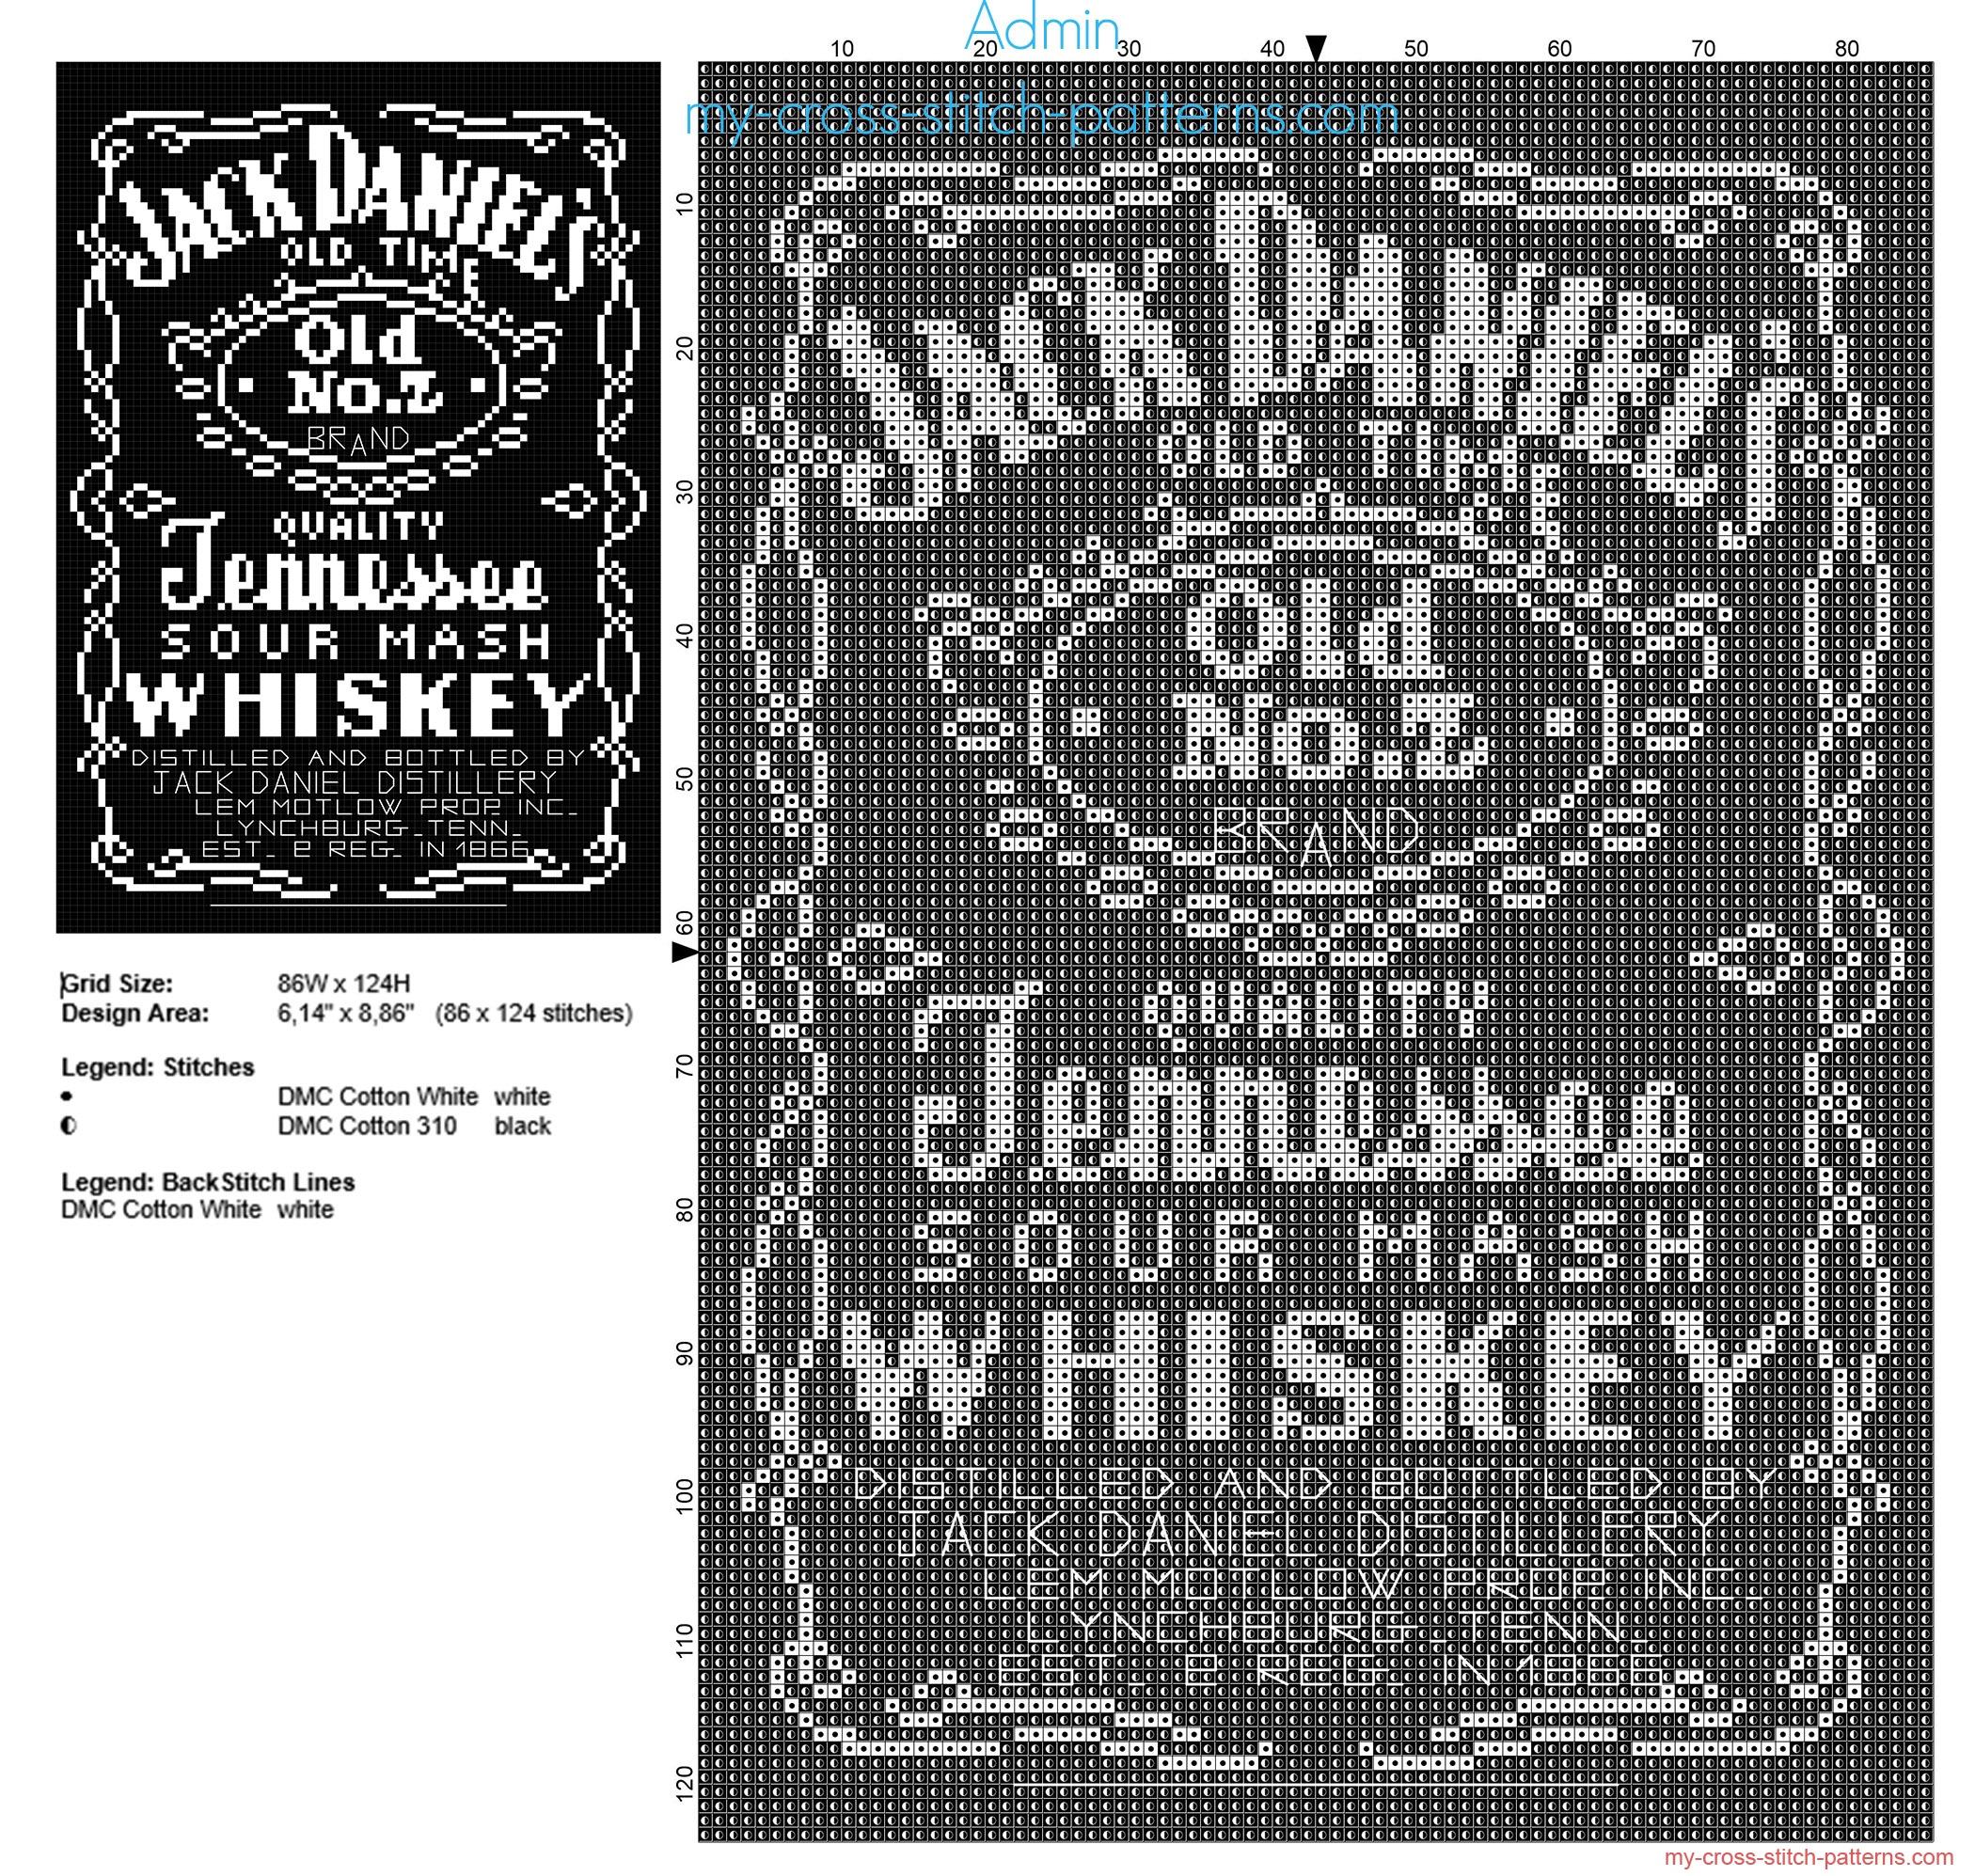 jack_daniels_whiskey_bottle_free_cross_stitch_pattern_86_x_124_stitches_2_dmc_threads